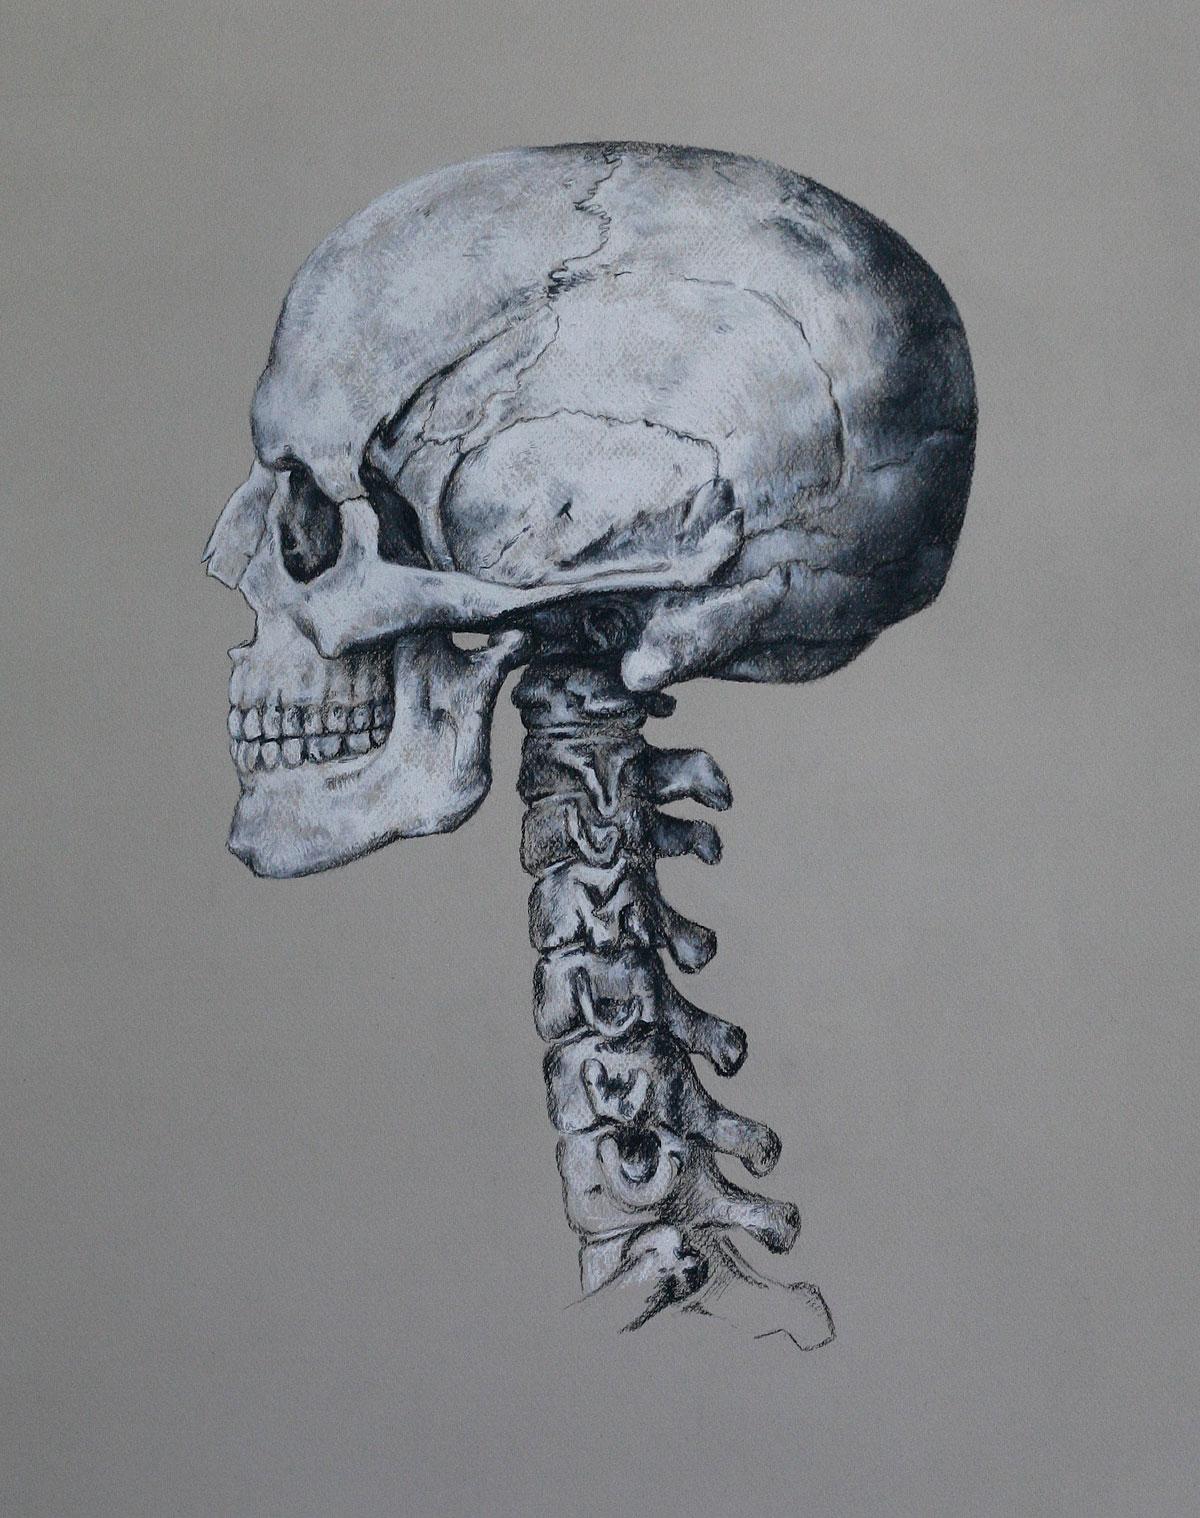 Mind and Specimen (Study no. 1)